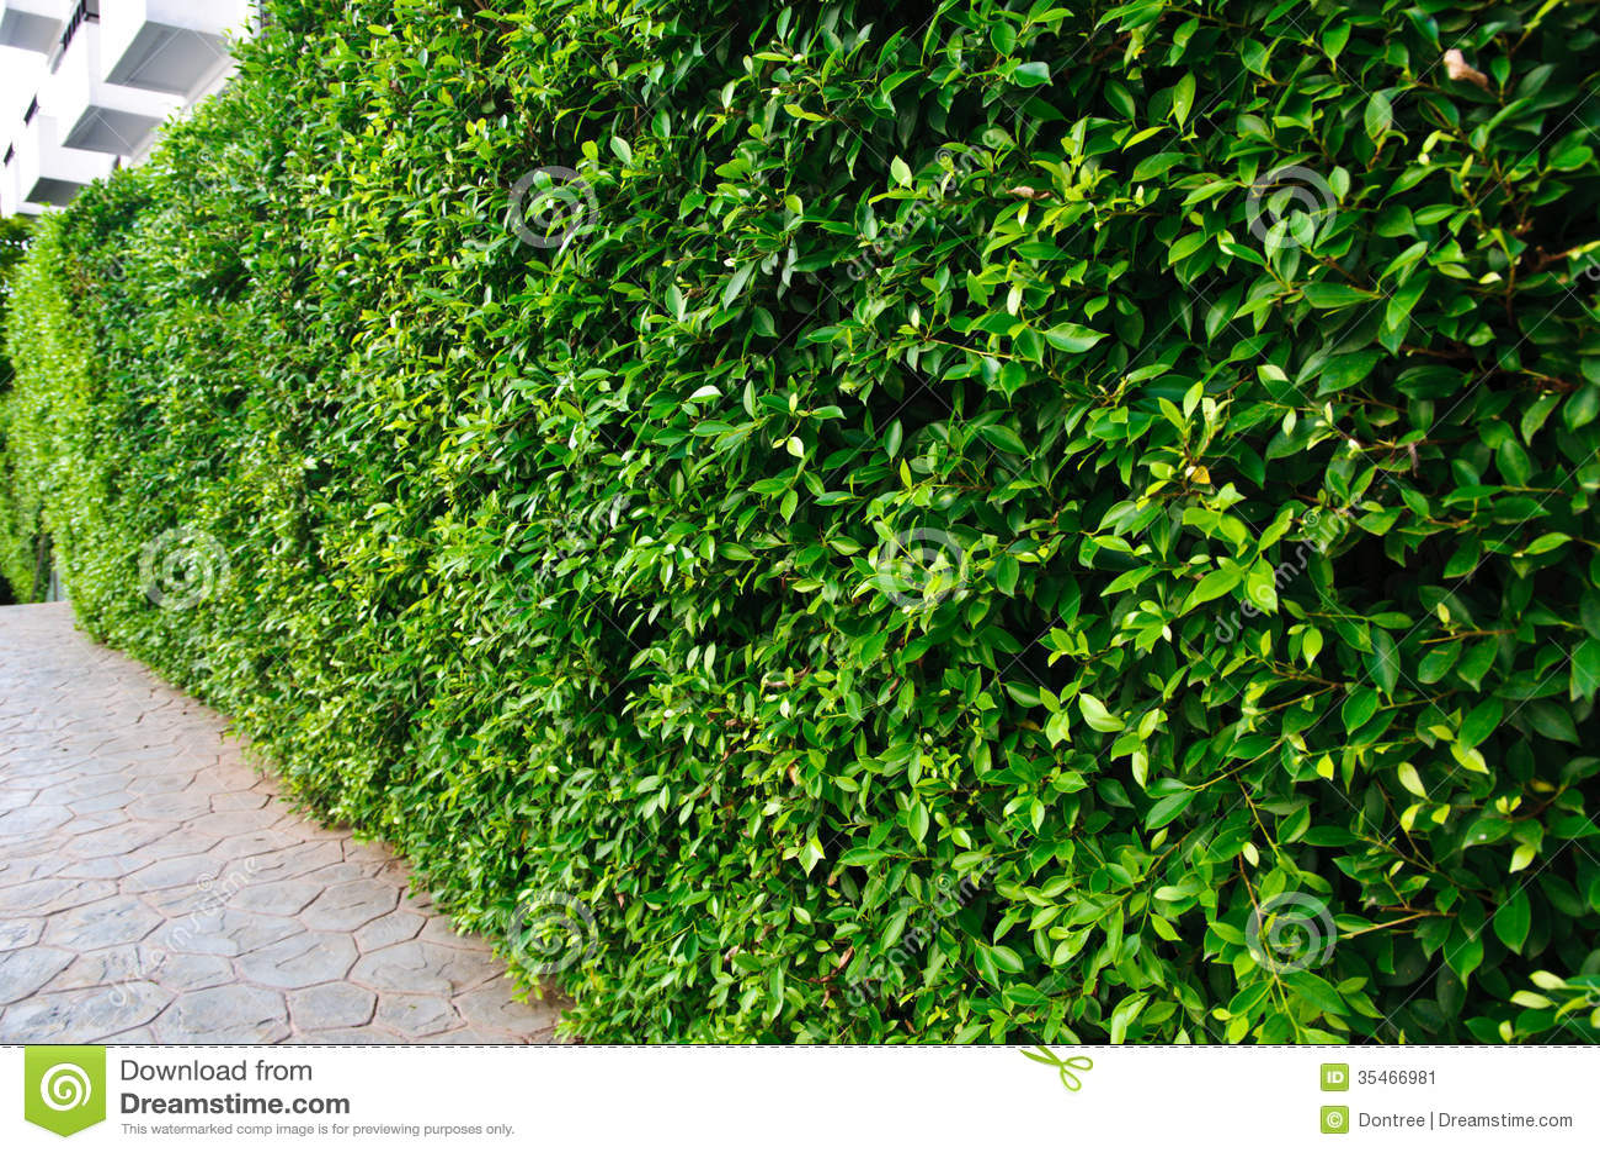 Garden garden bush background stock image image 35466981 for Arbustos de jardin nombres